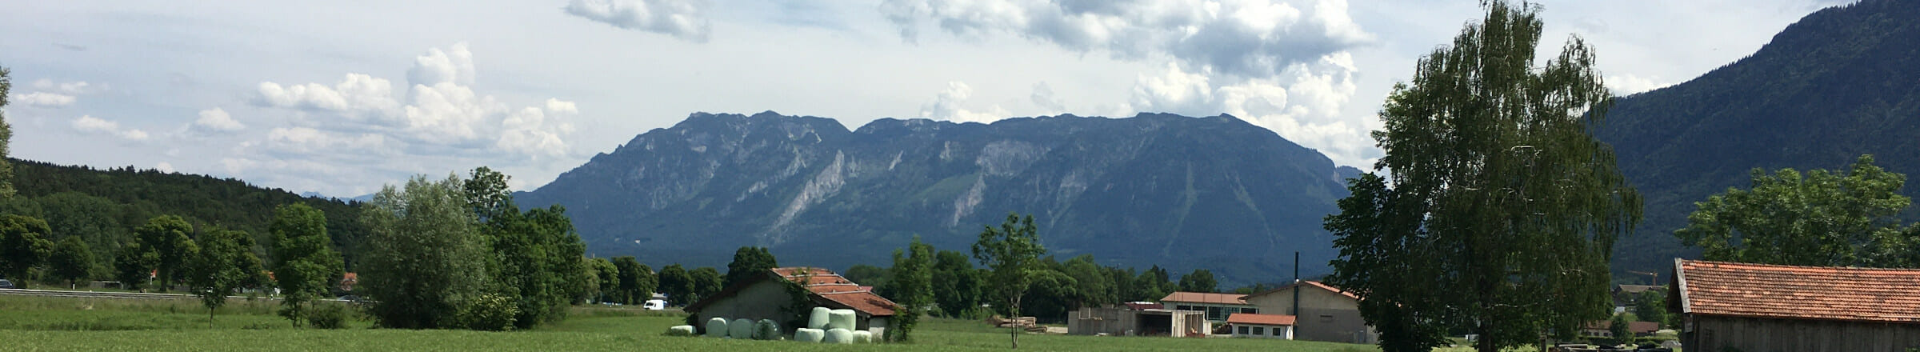 Anger Bayern - Berchtesgadener Land